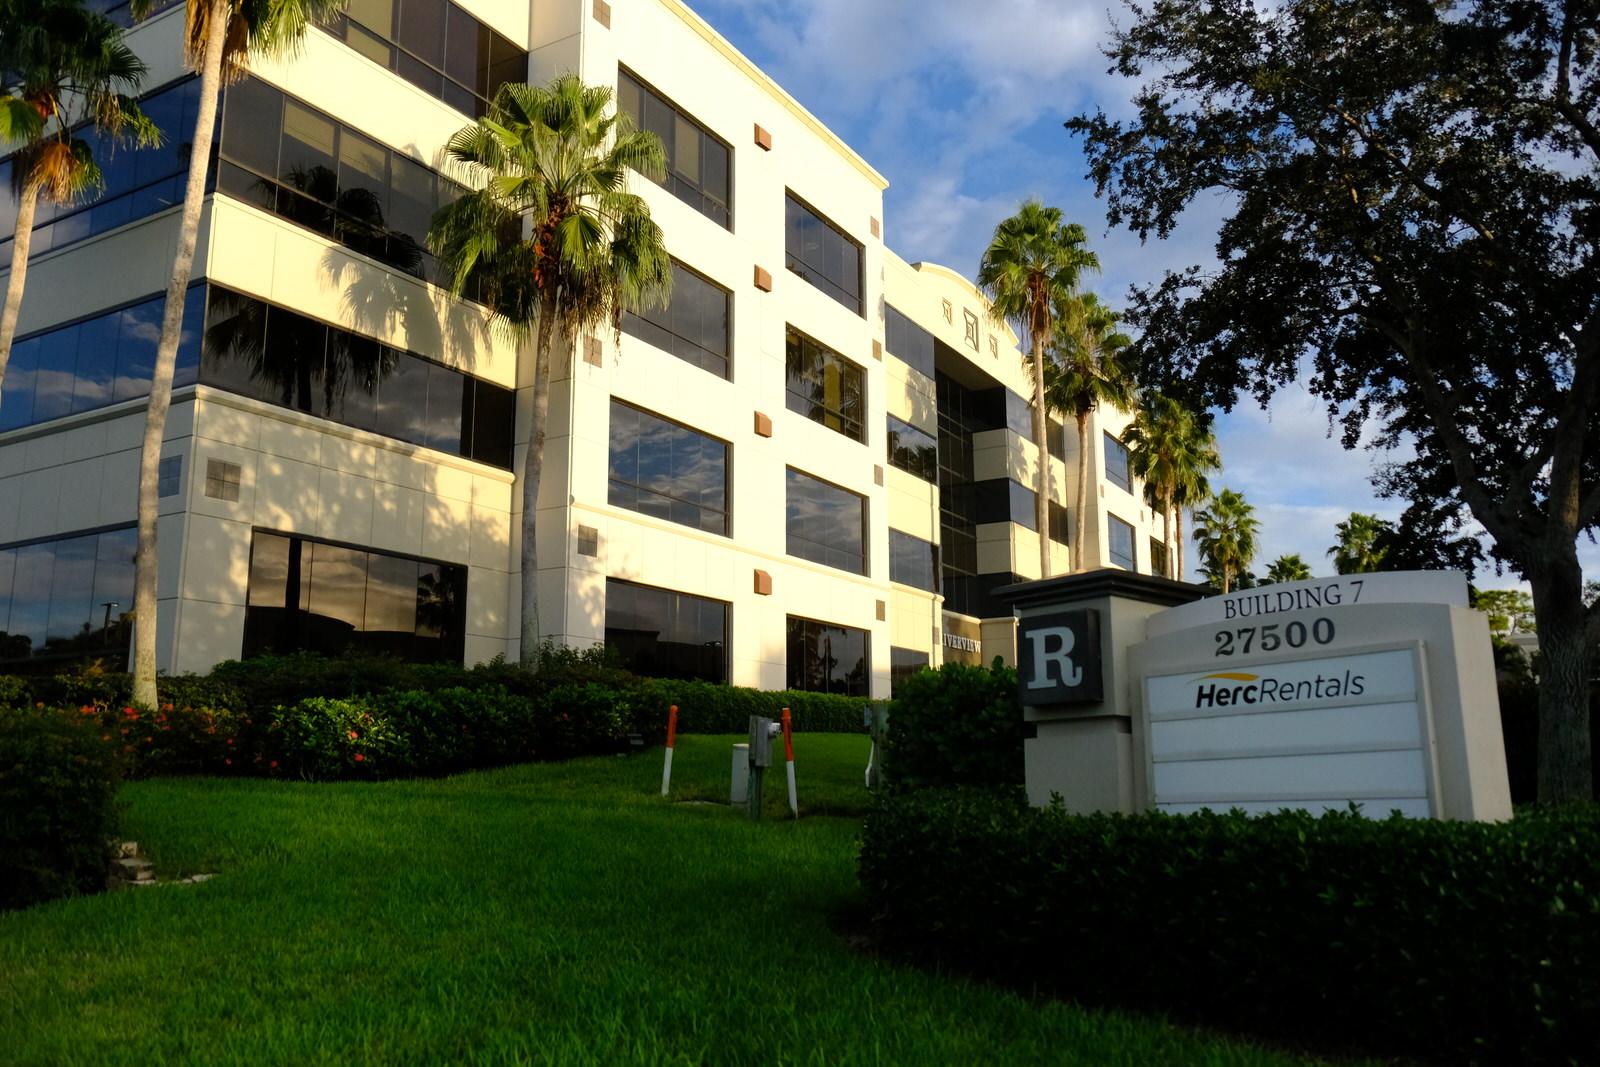 Herc Holdings' corporate headquarters in Bonita Springs, Florida.